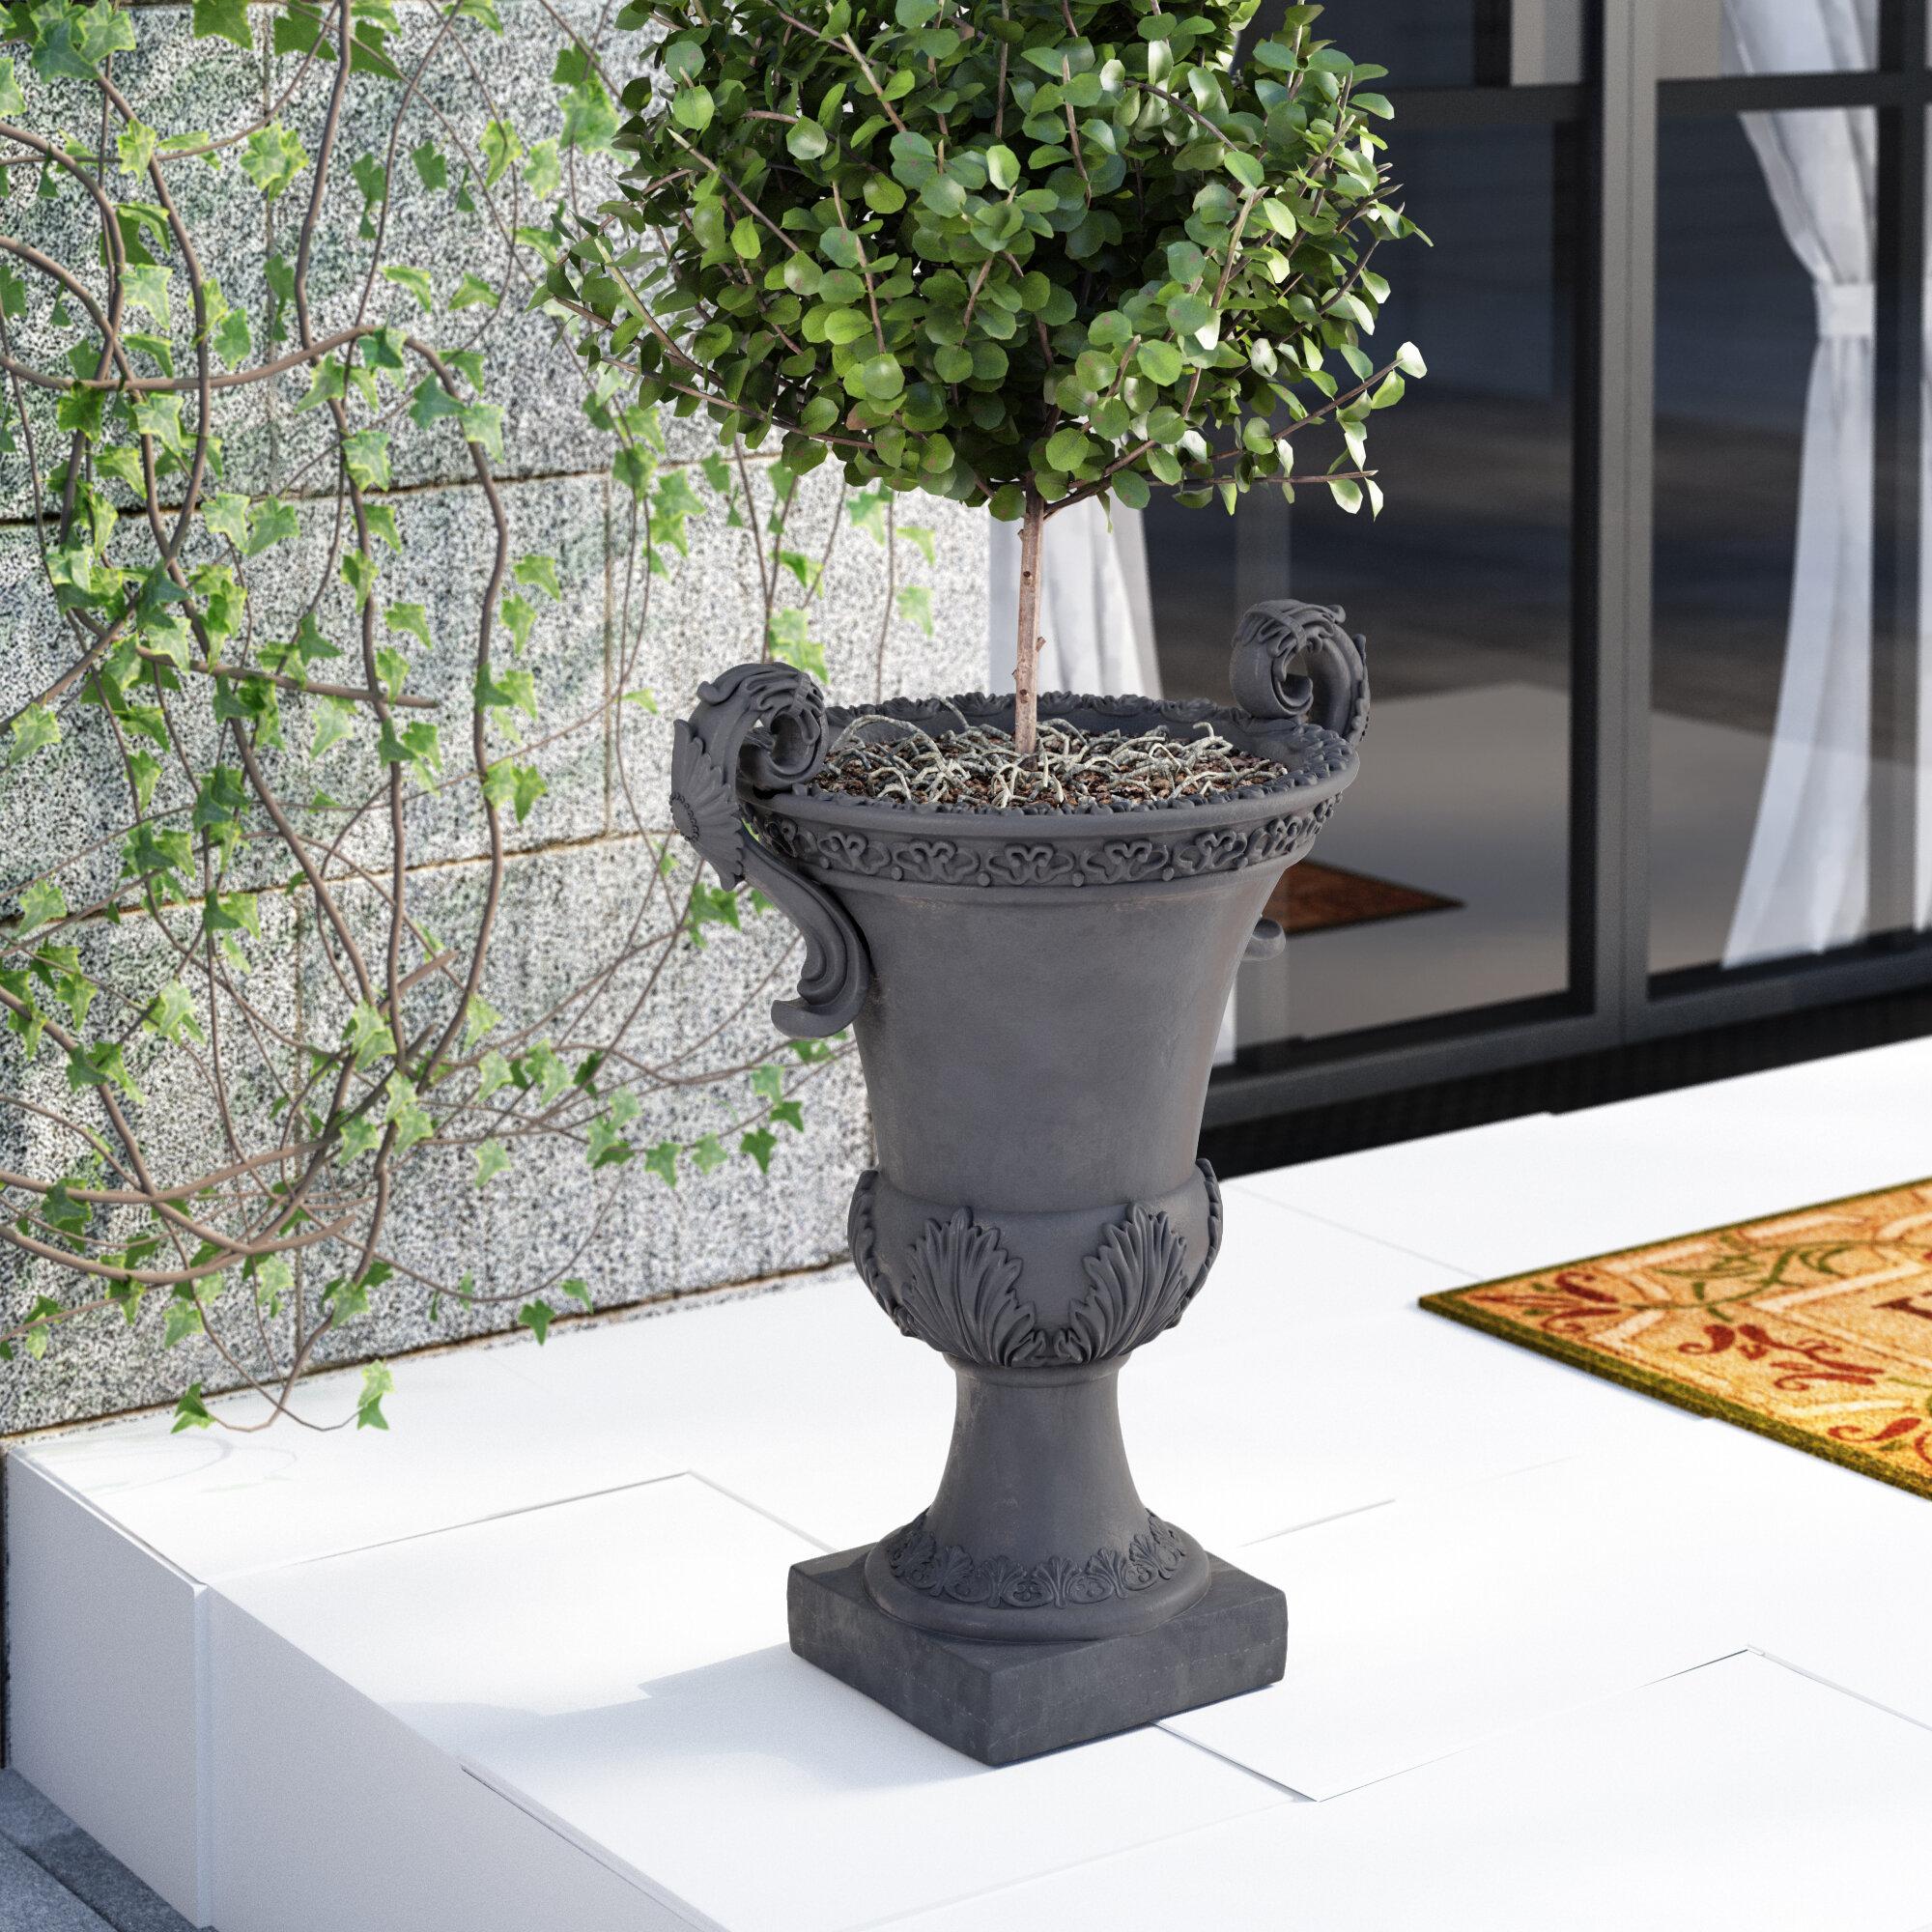 Giroux Chalice Concrete Urn Planter